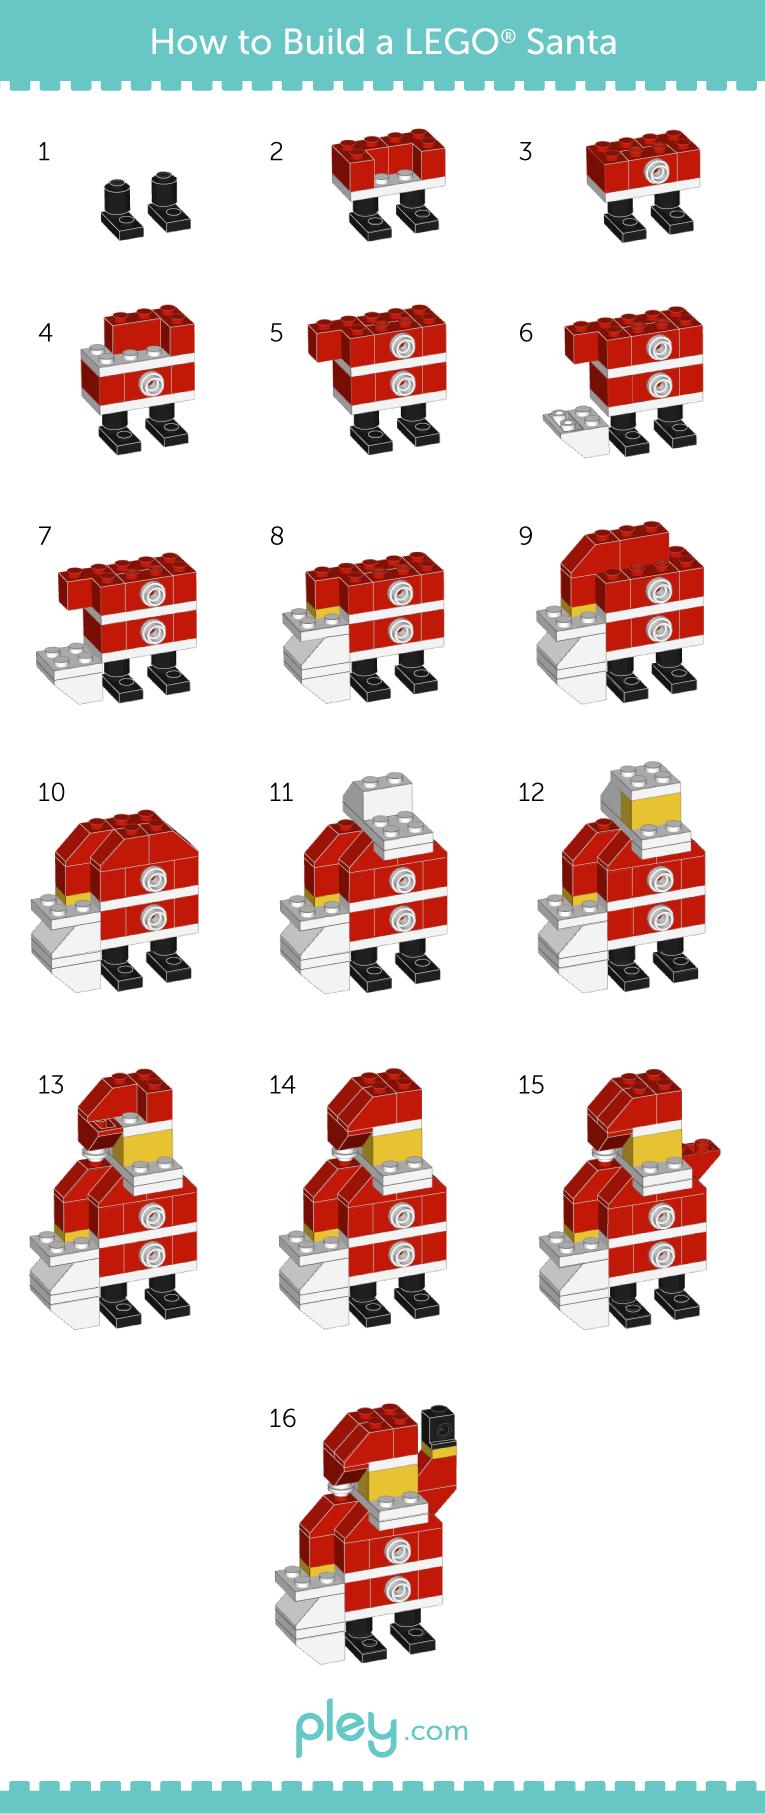 Pley reveals how to build a lego snowman christmas tree and santa